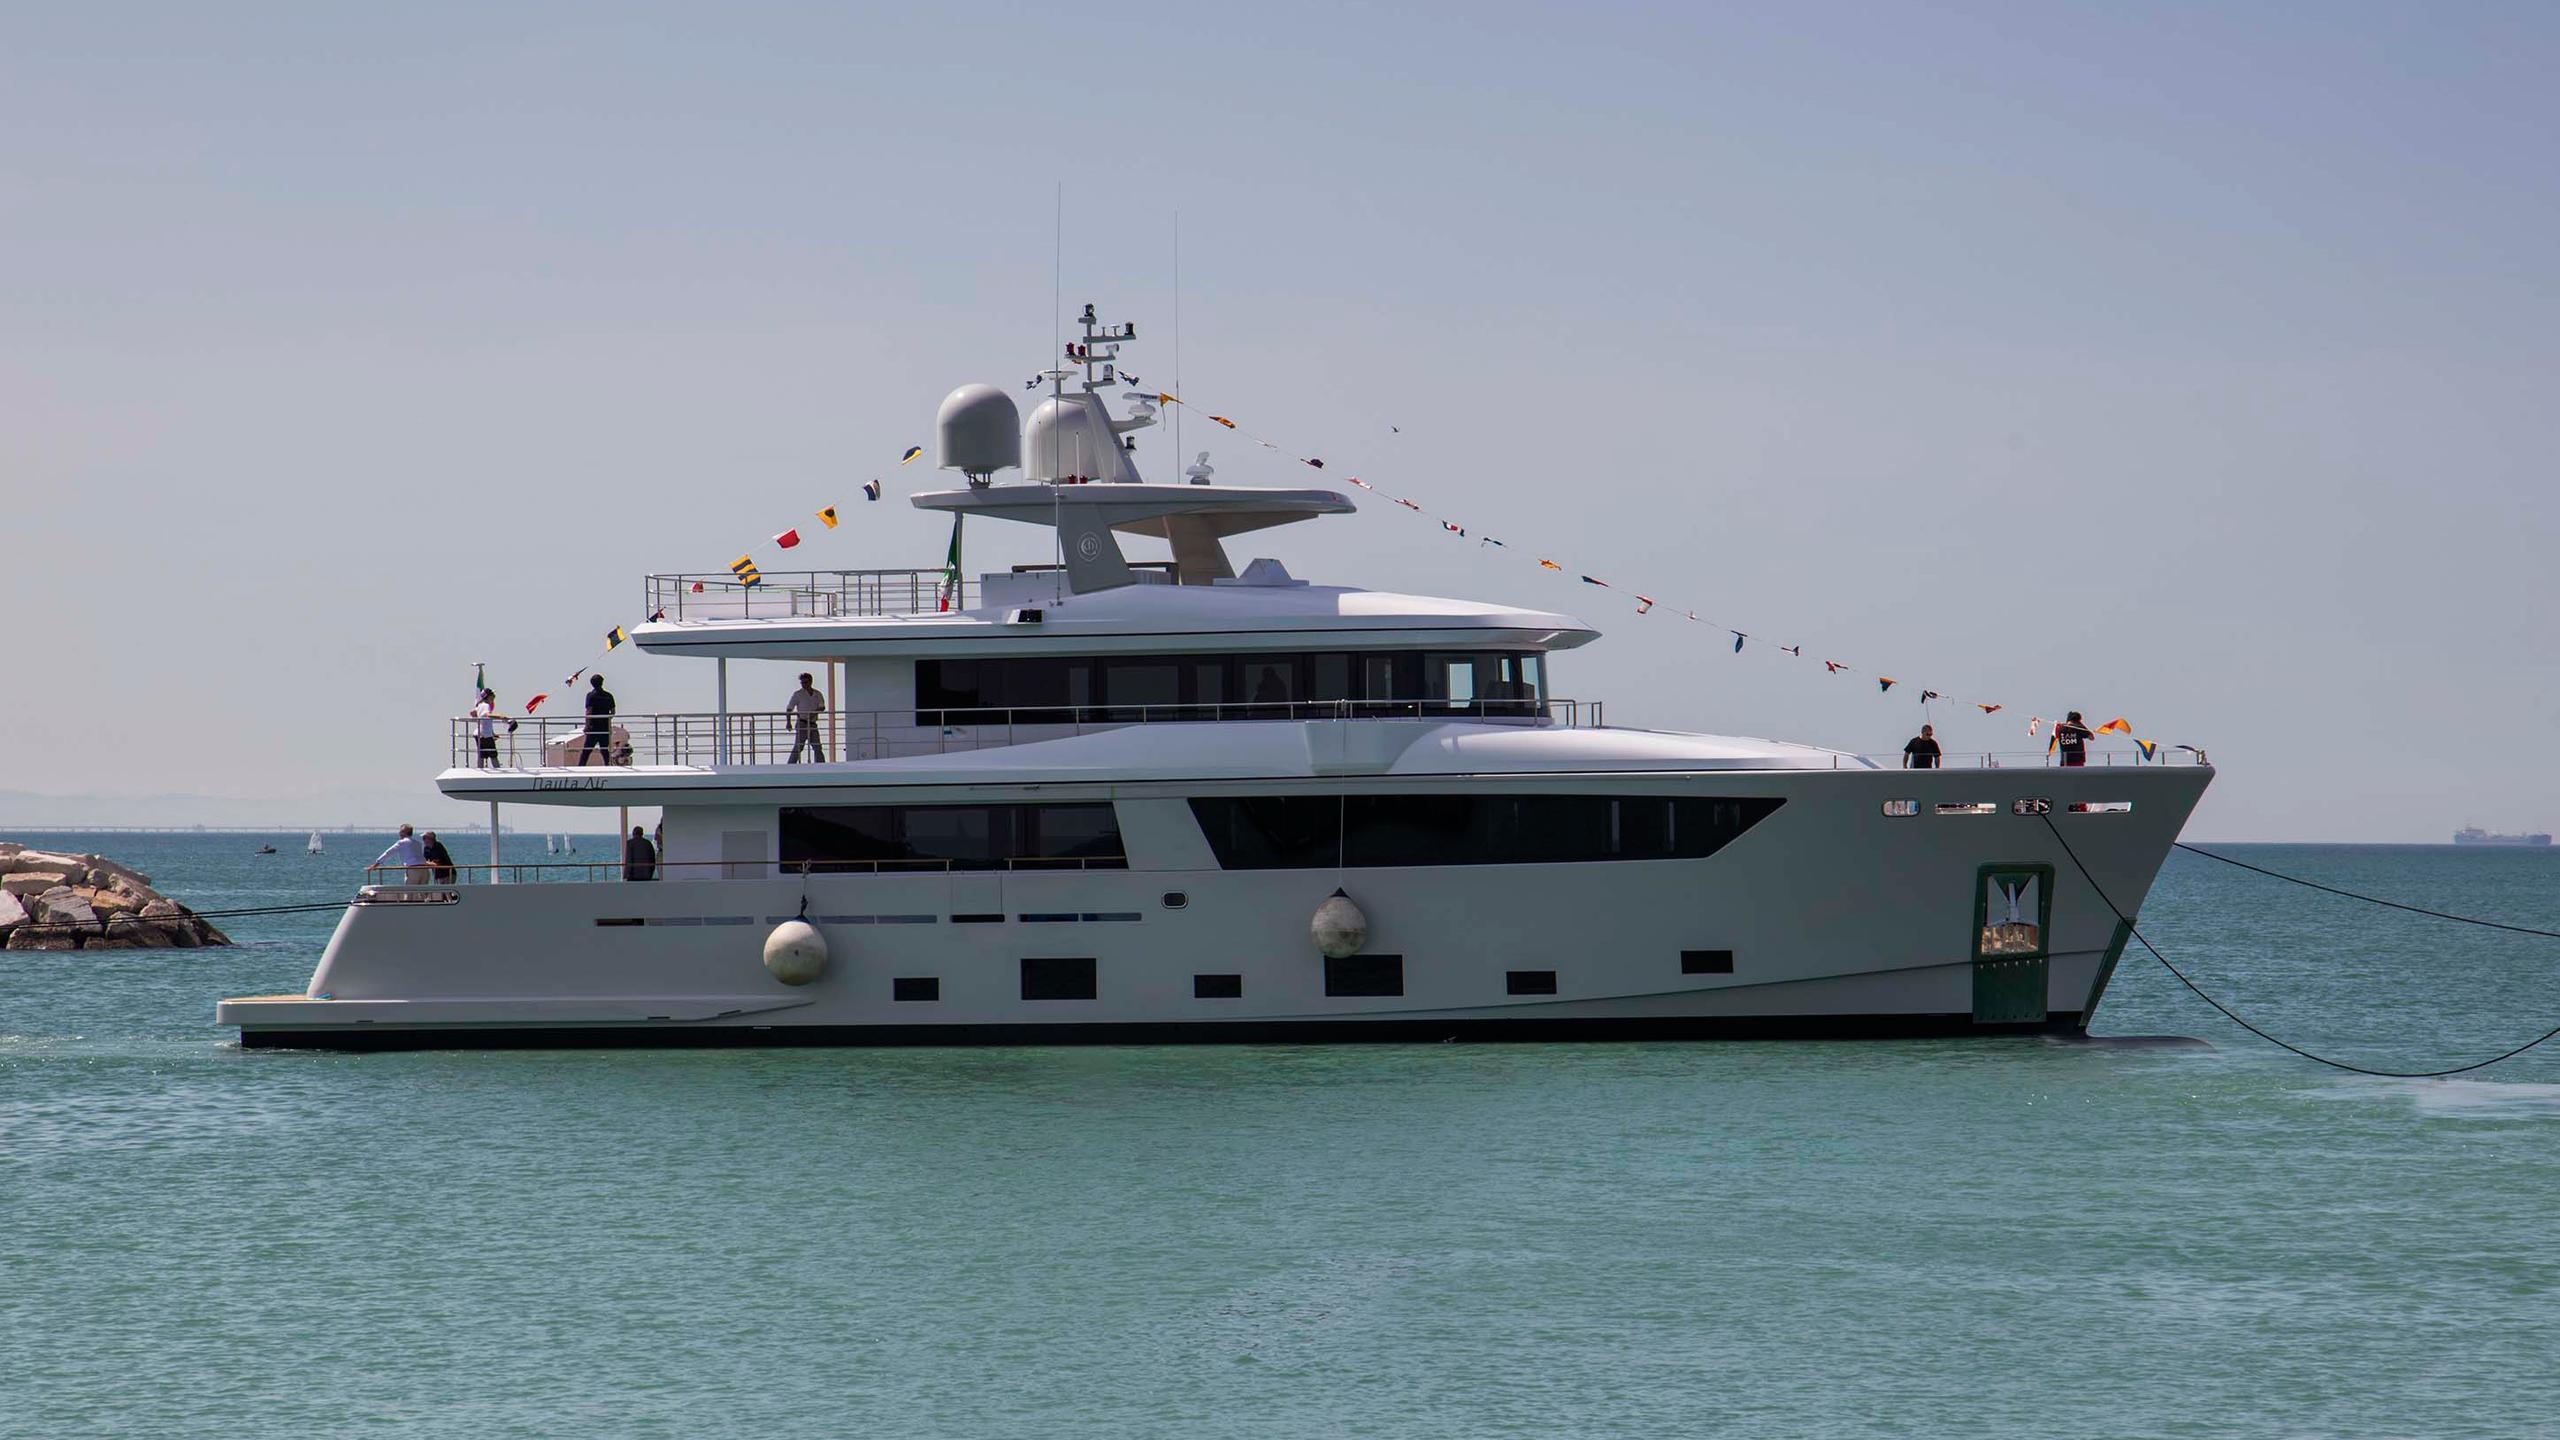 narvalo-motor-yacht-cantiere-delle-marche-2016-31m-nauta-air-108-profile-anchored